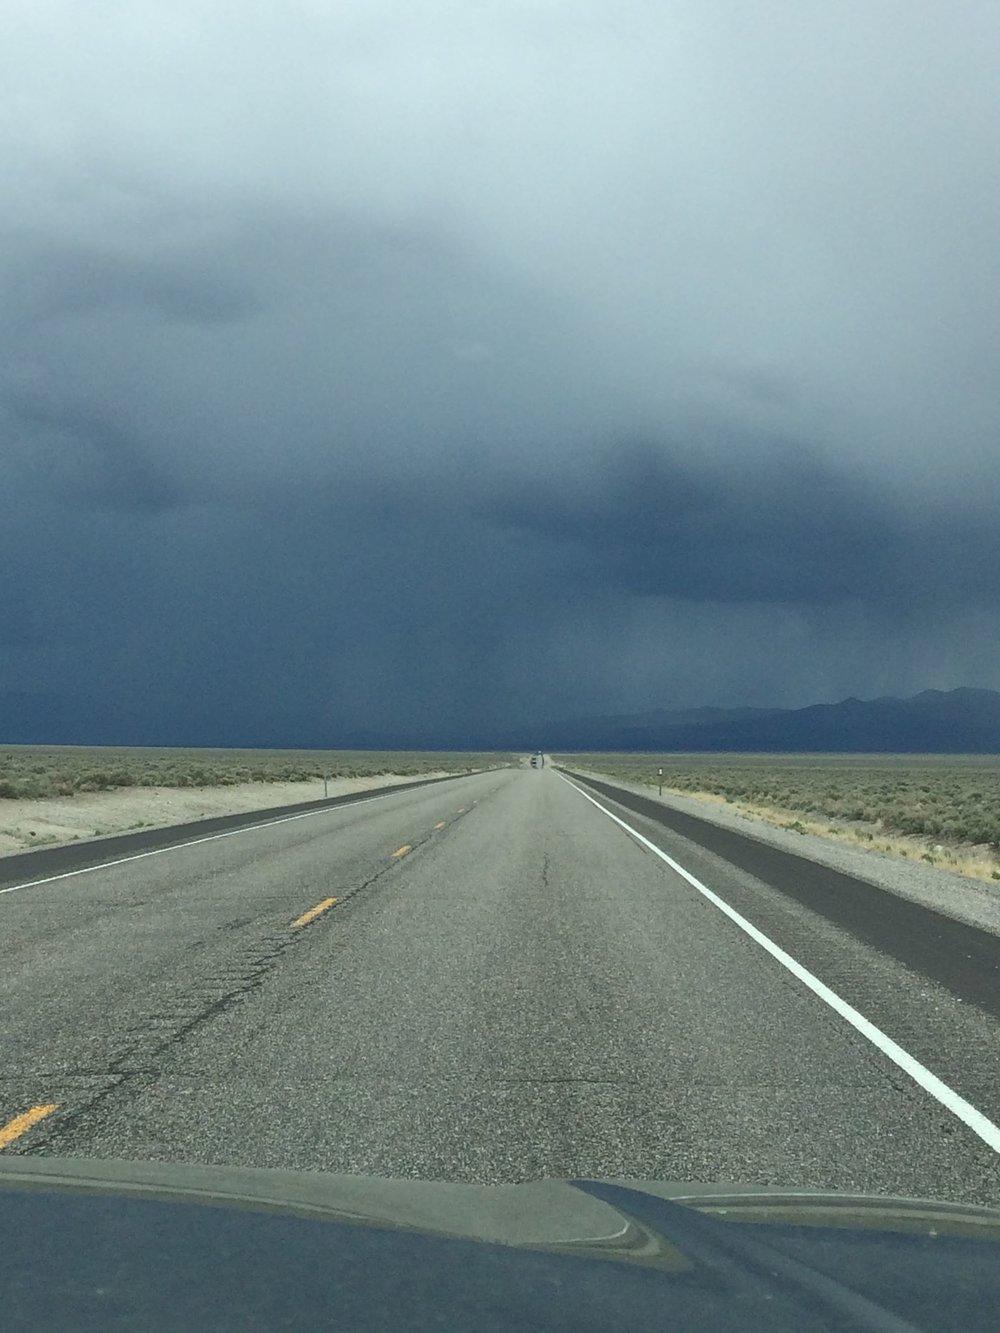 Photo taken during our drive to Phoenix, AZ